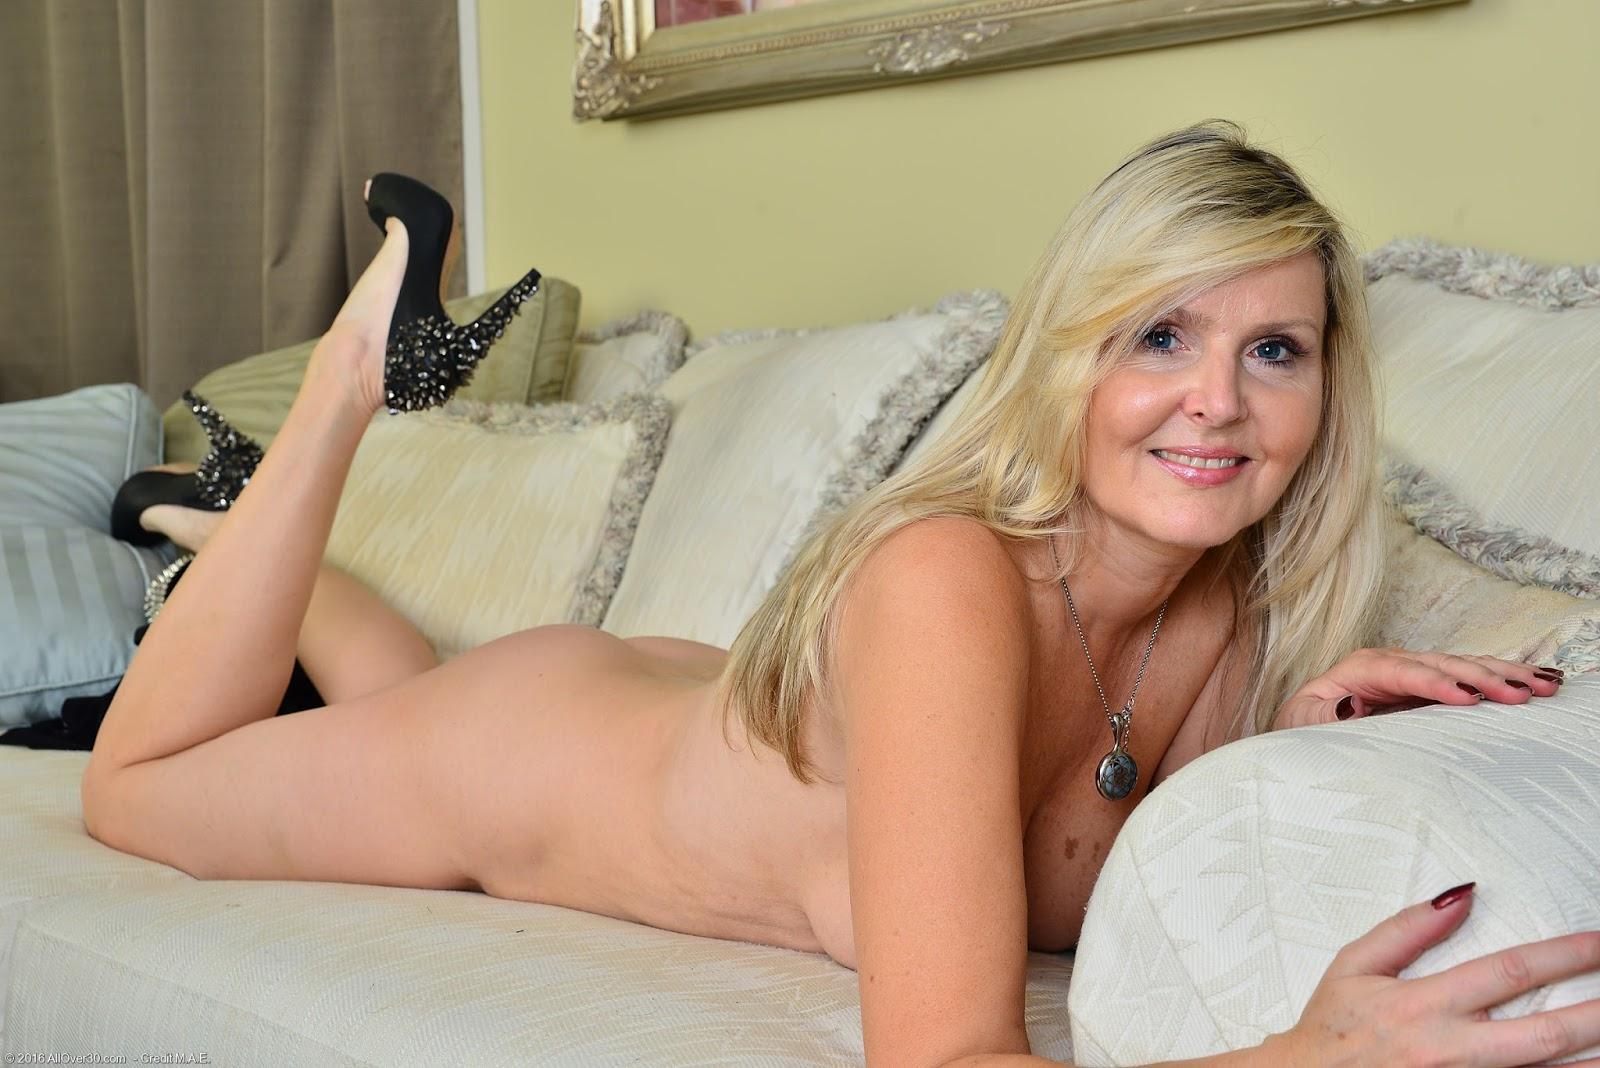 All naked mom spreading her legs